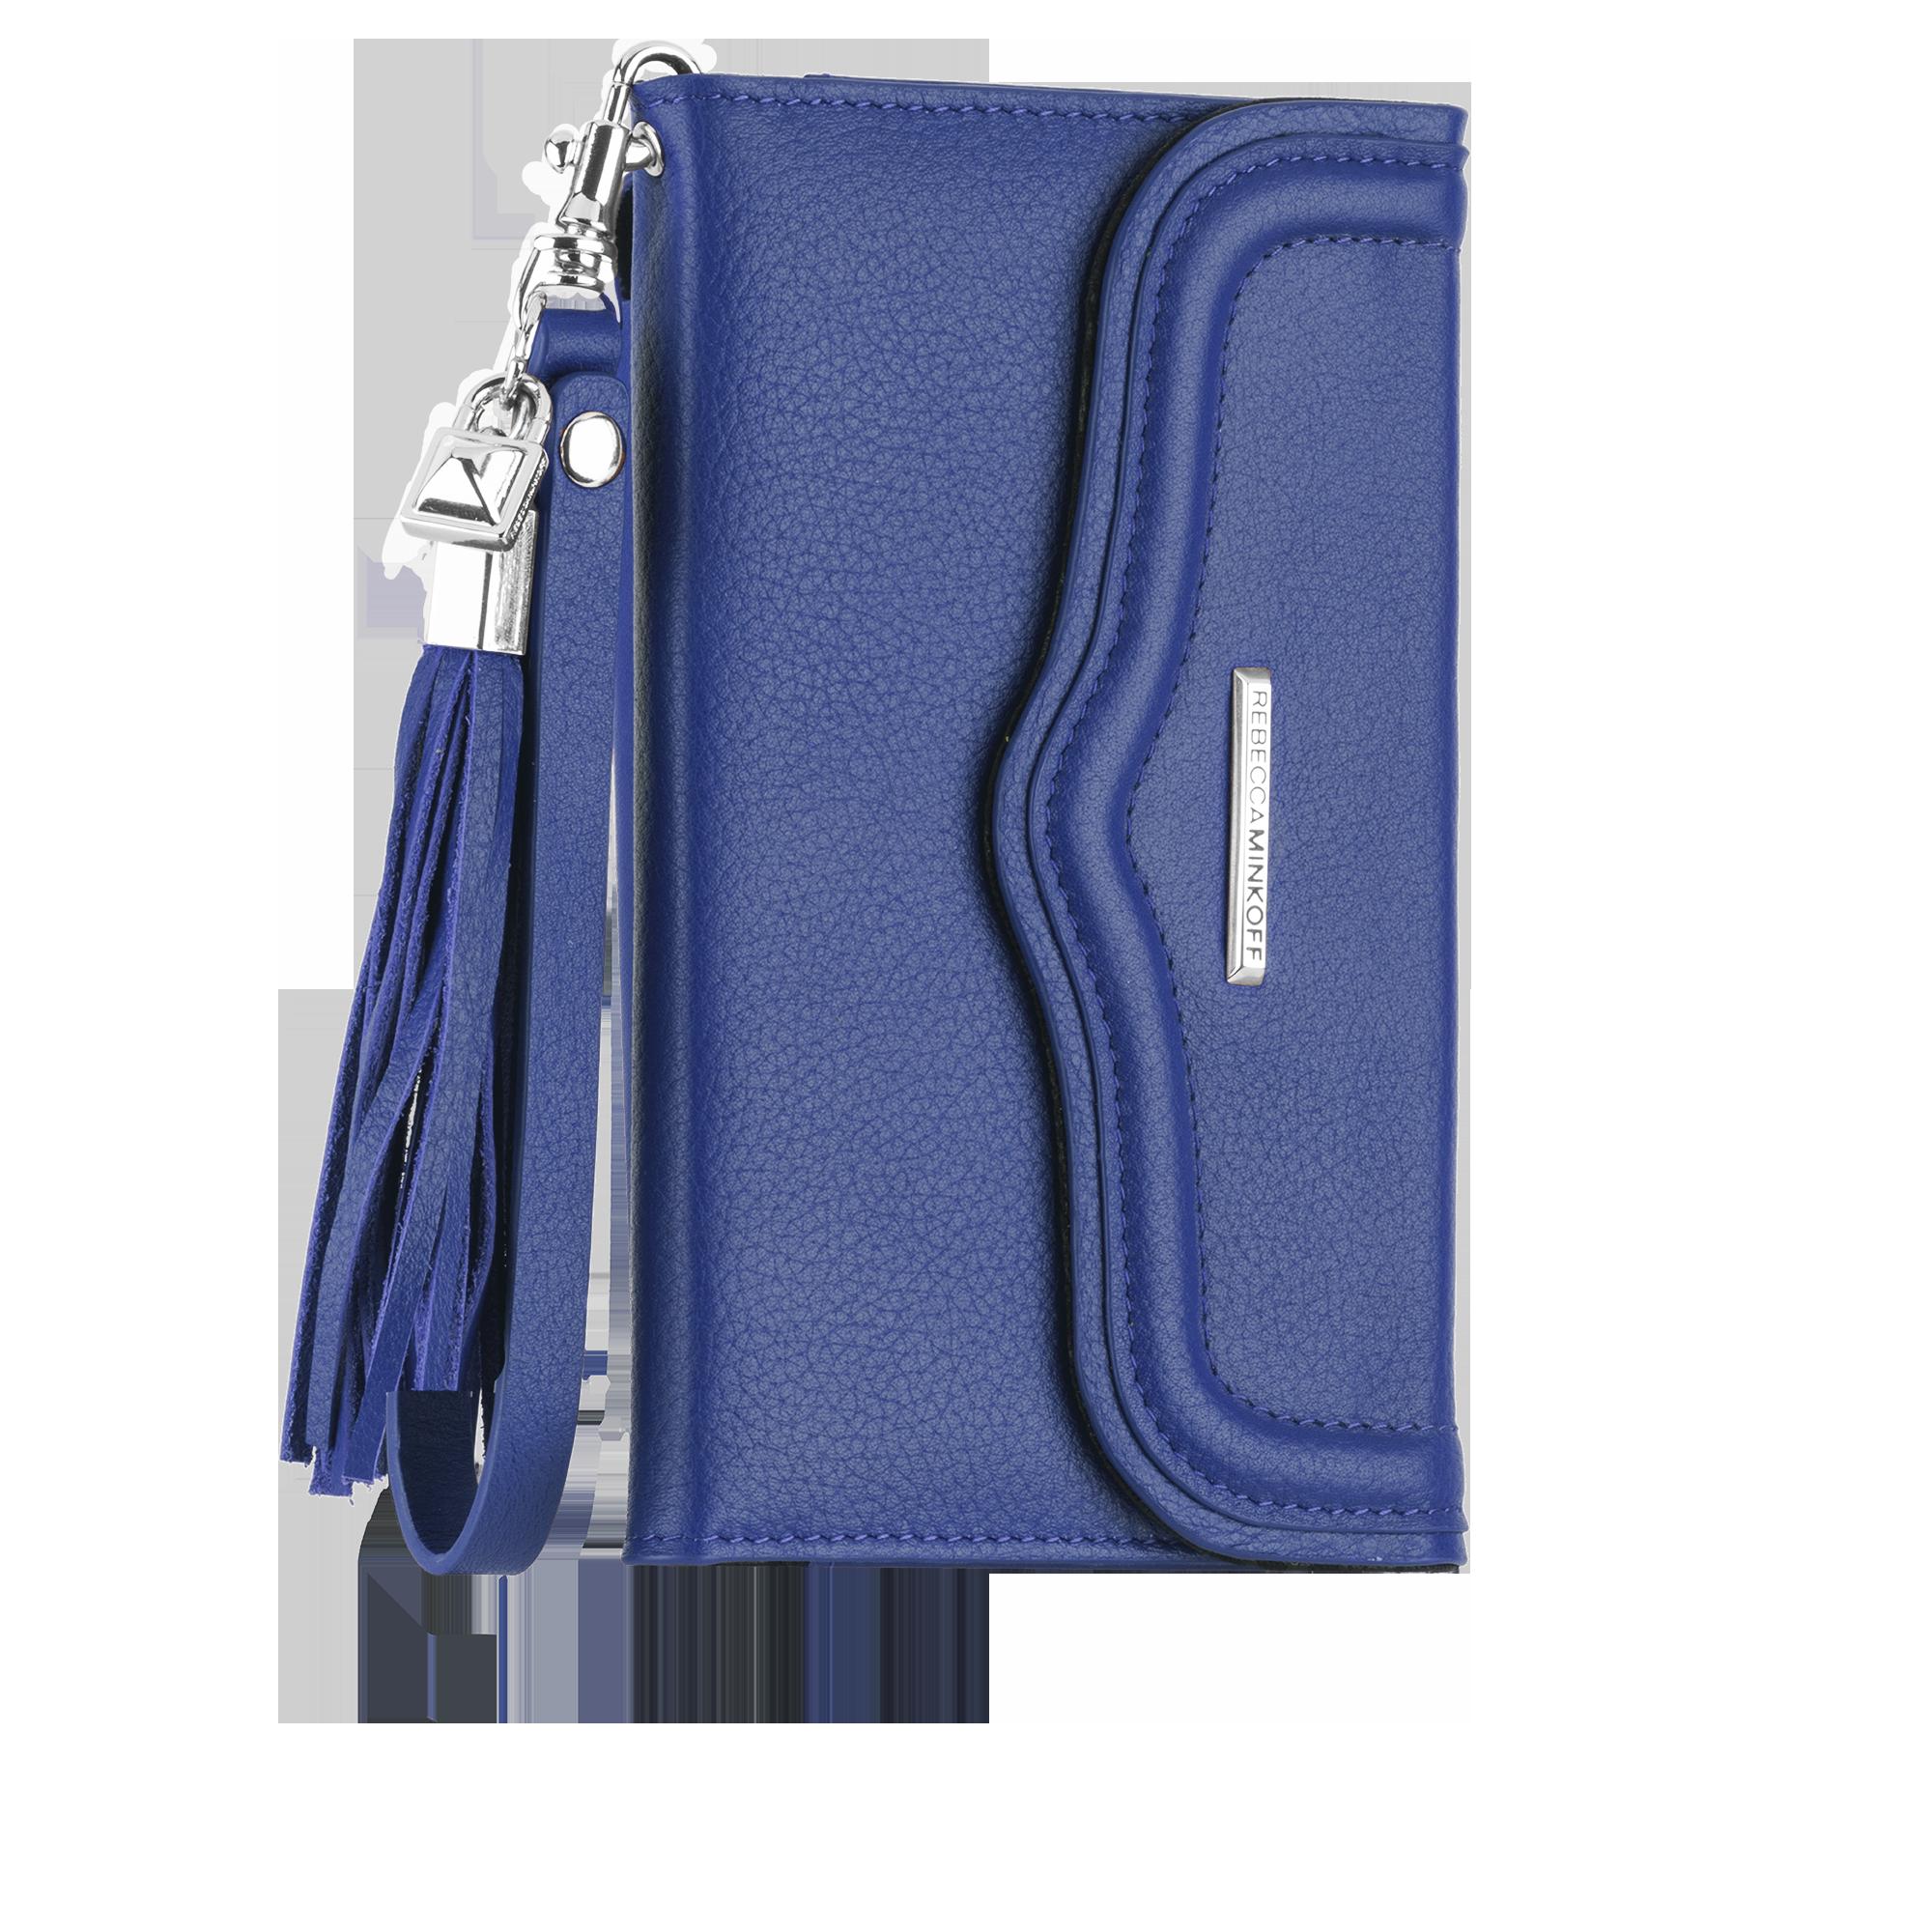 Rebecca Minkoff Universal Tassel Wristlet - Cobalt